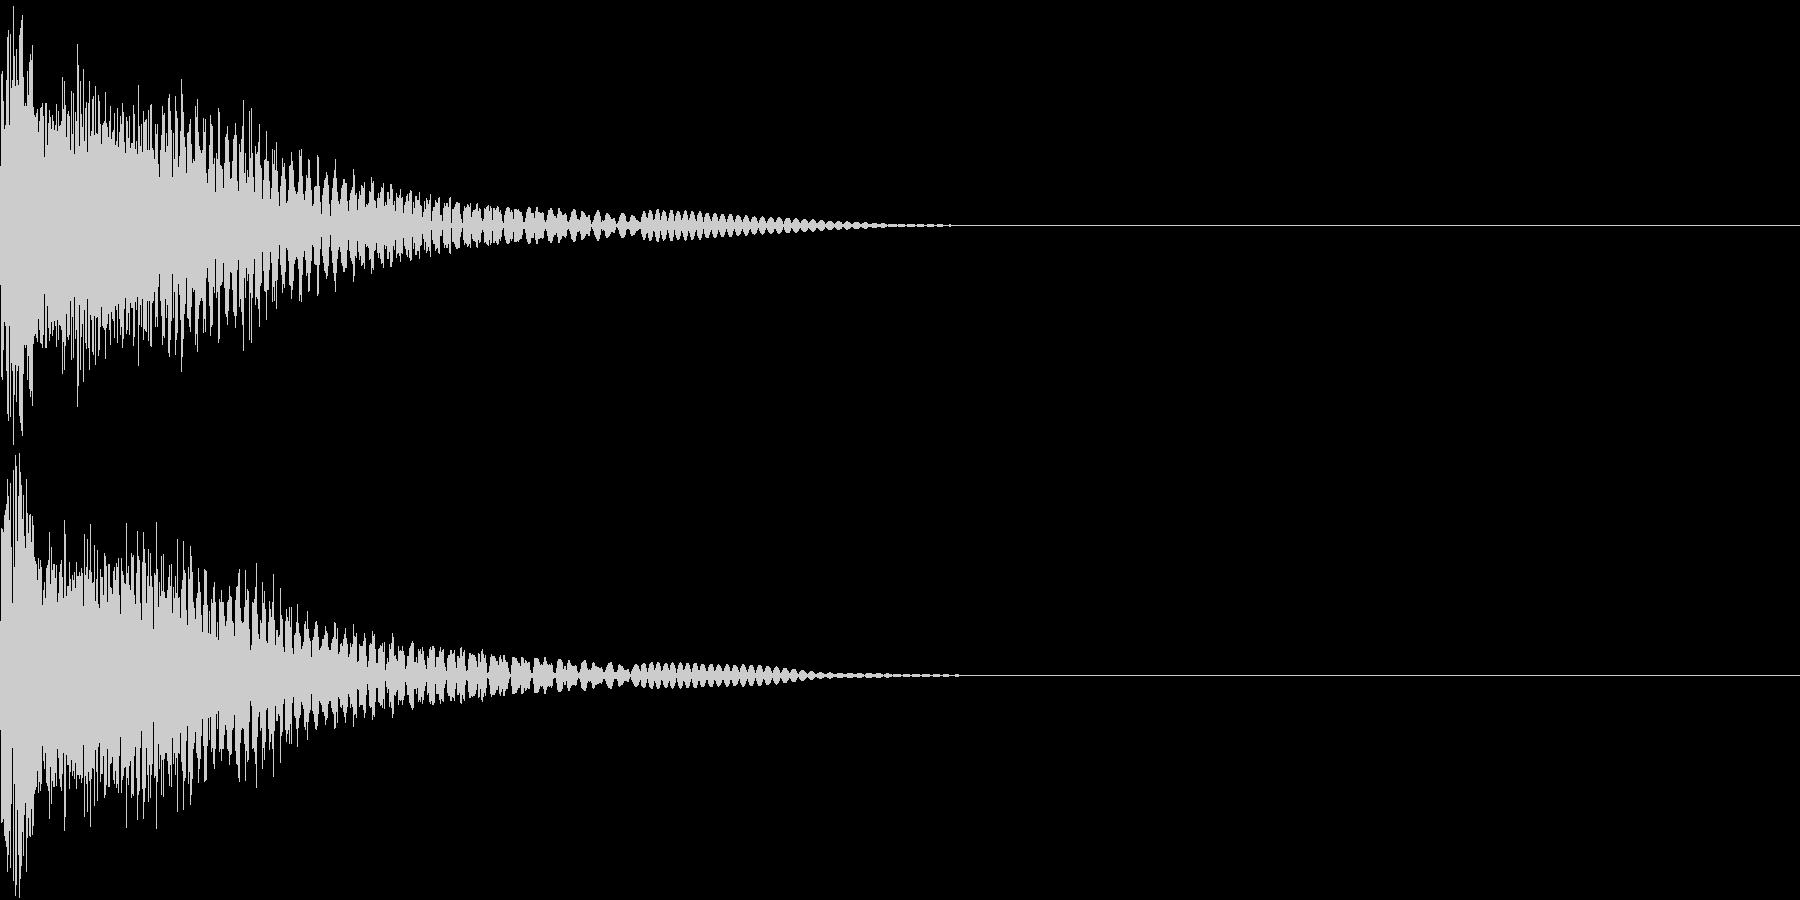 Robo ロボアニメ ビームソード斬撃音の未再生の波形